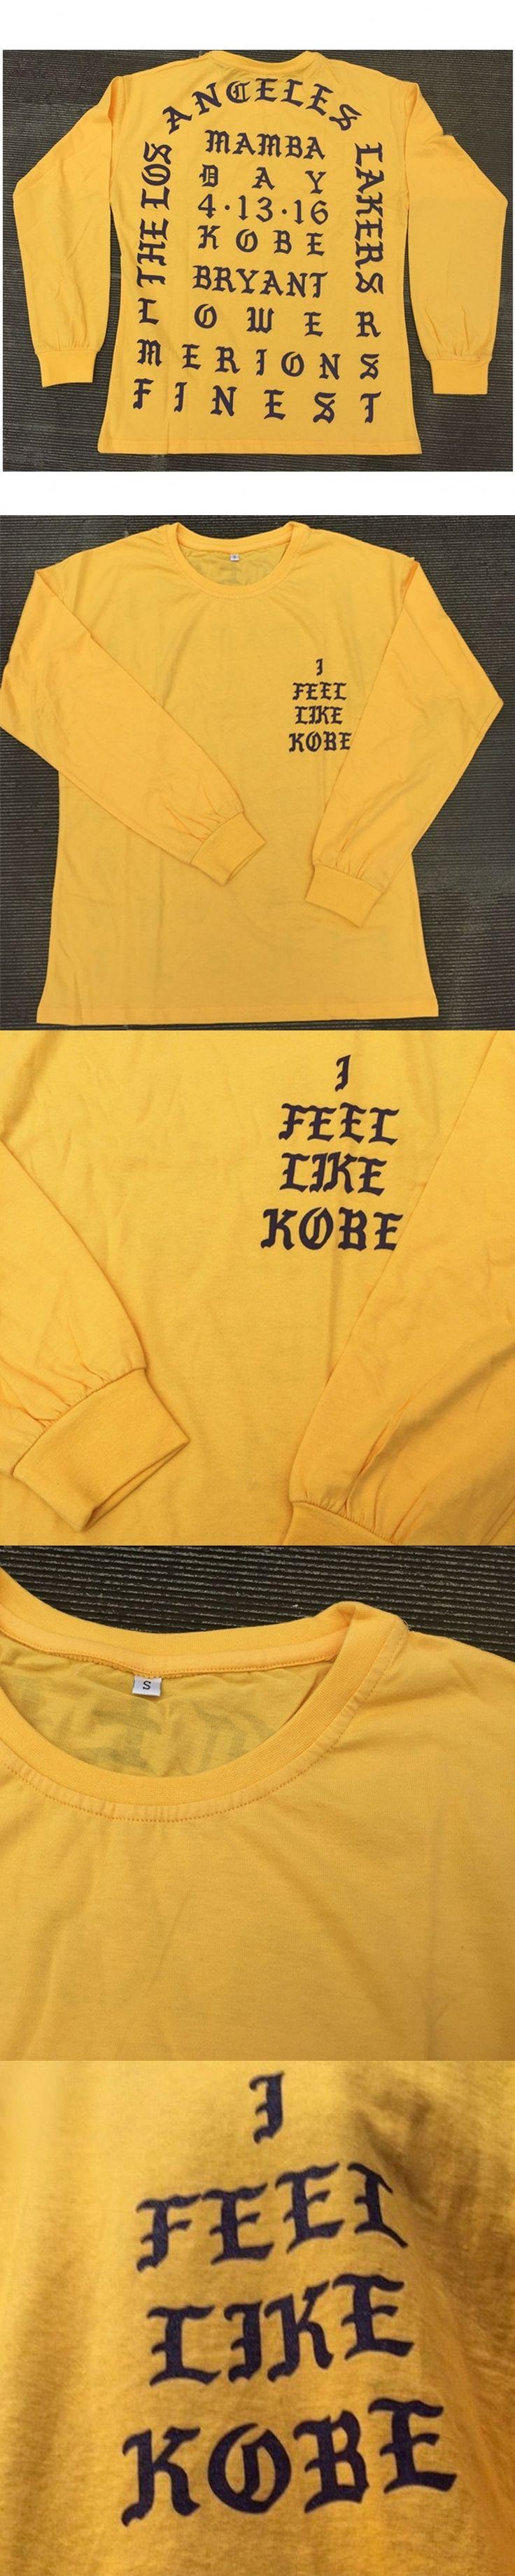 I Feel Like Kobe Mamba Day Pablo MSG Long Sleeve kanye west T shirt GOLD Color Purple Letters Weekend Life Freeshipping cmy1126